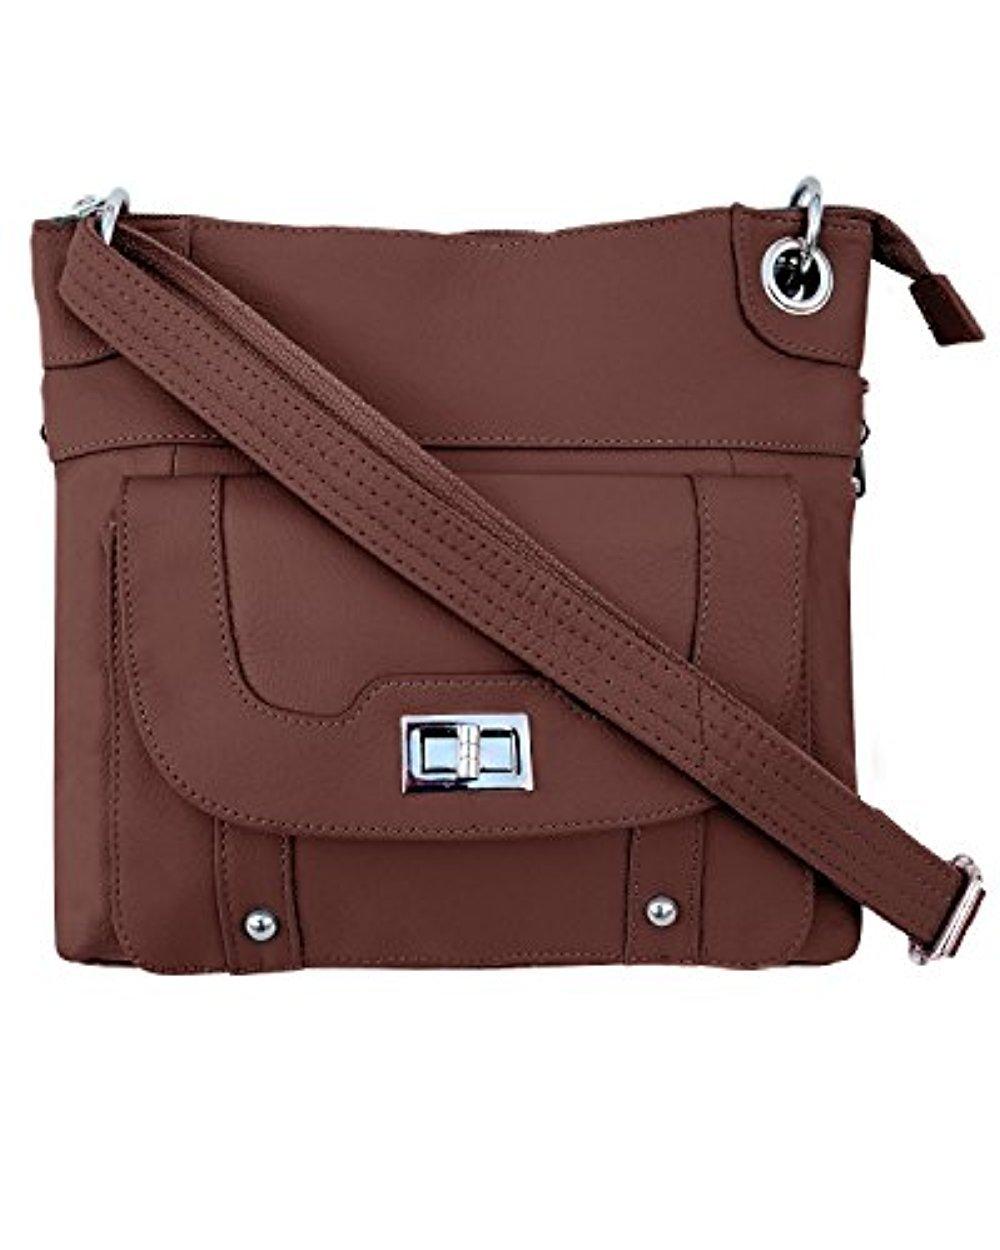 Roma Leathers Gun Concealment Crossbody Bag Cowhide Leather, Metal Twist Lock Buckle -Brown